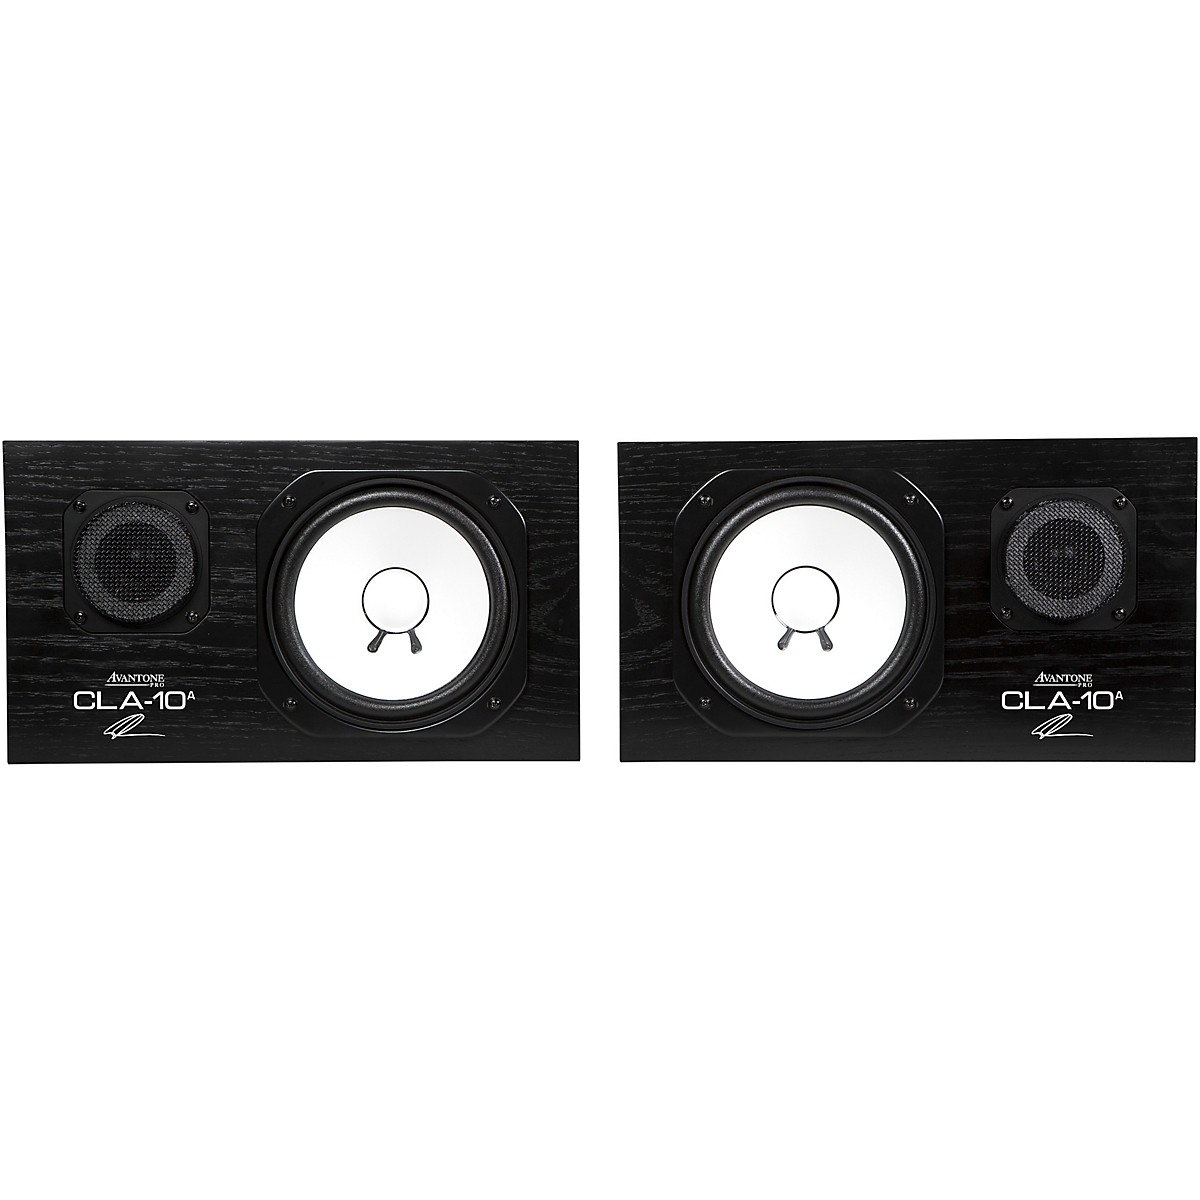 Avantone CLA-10A Chris Lord-Alge Active Studio Monitors